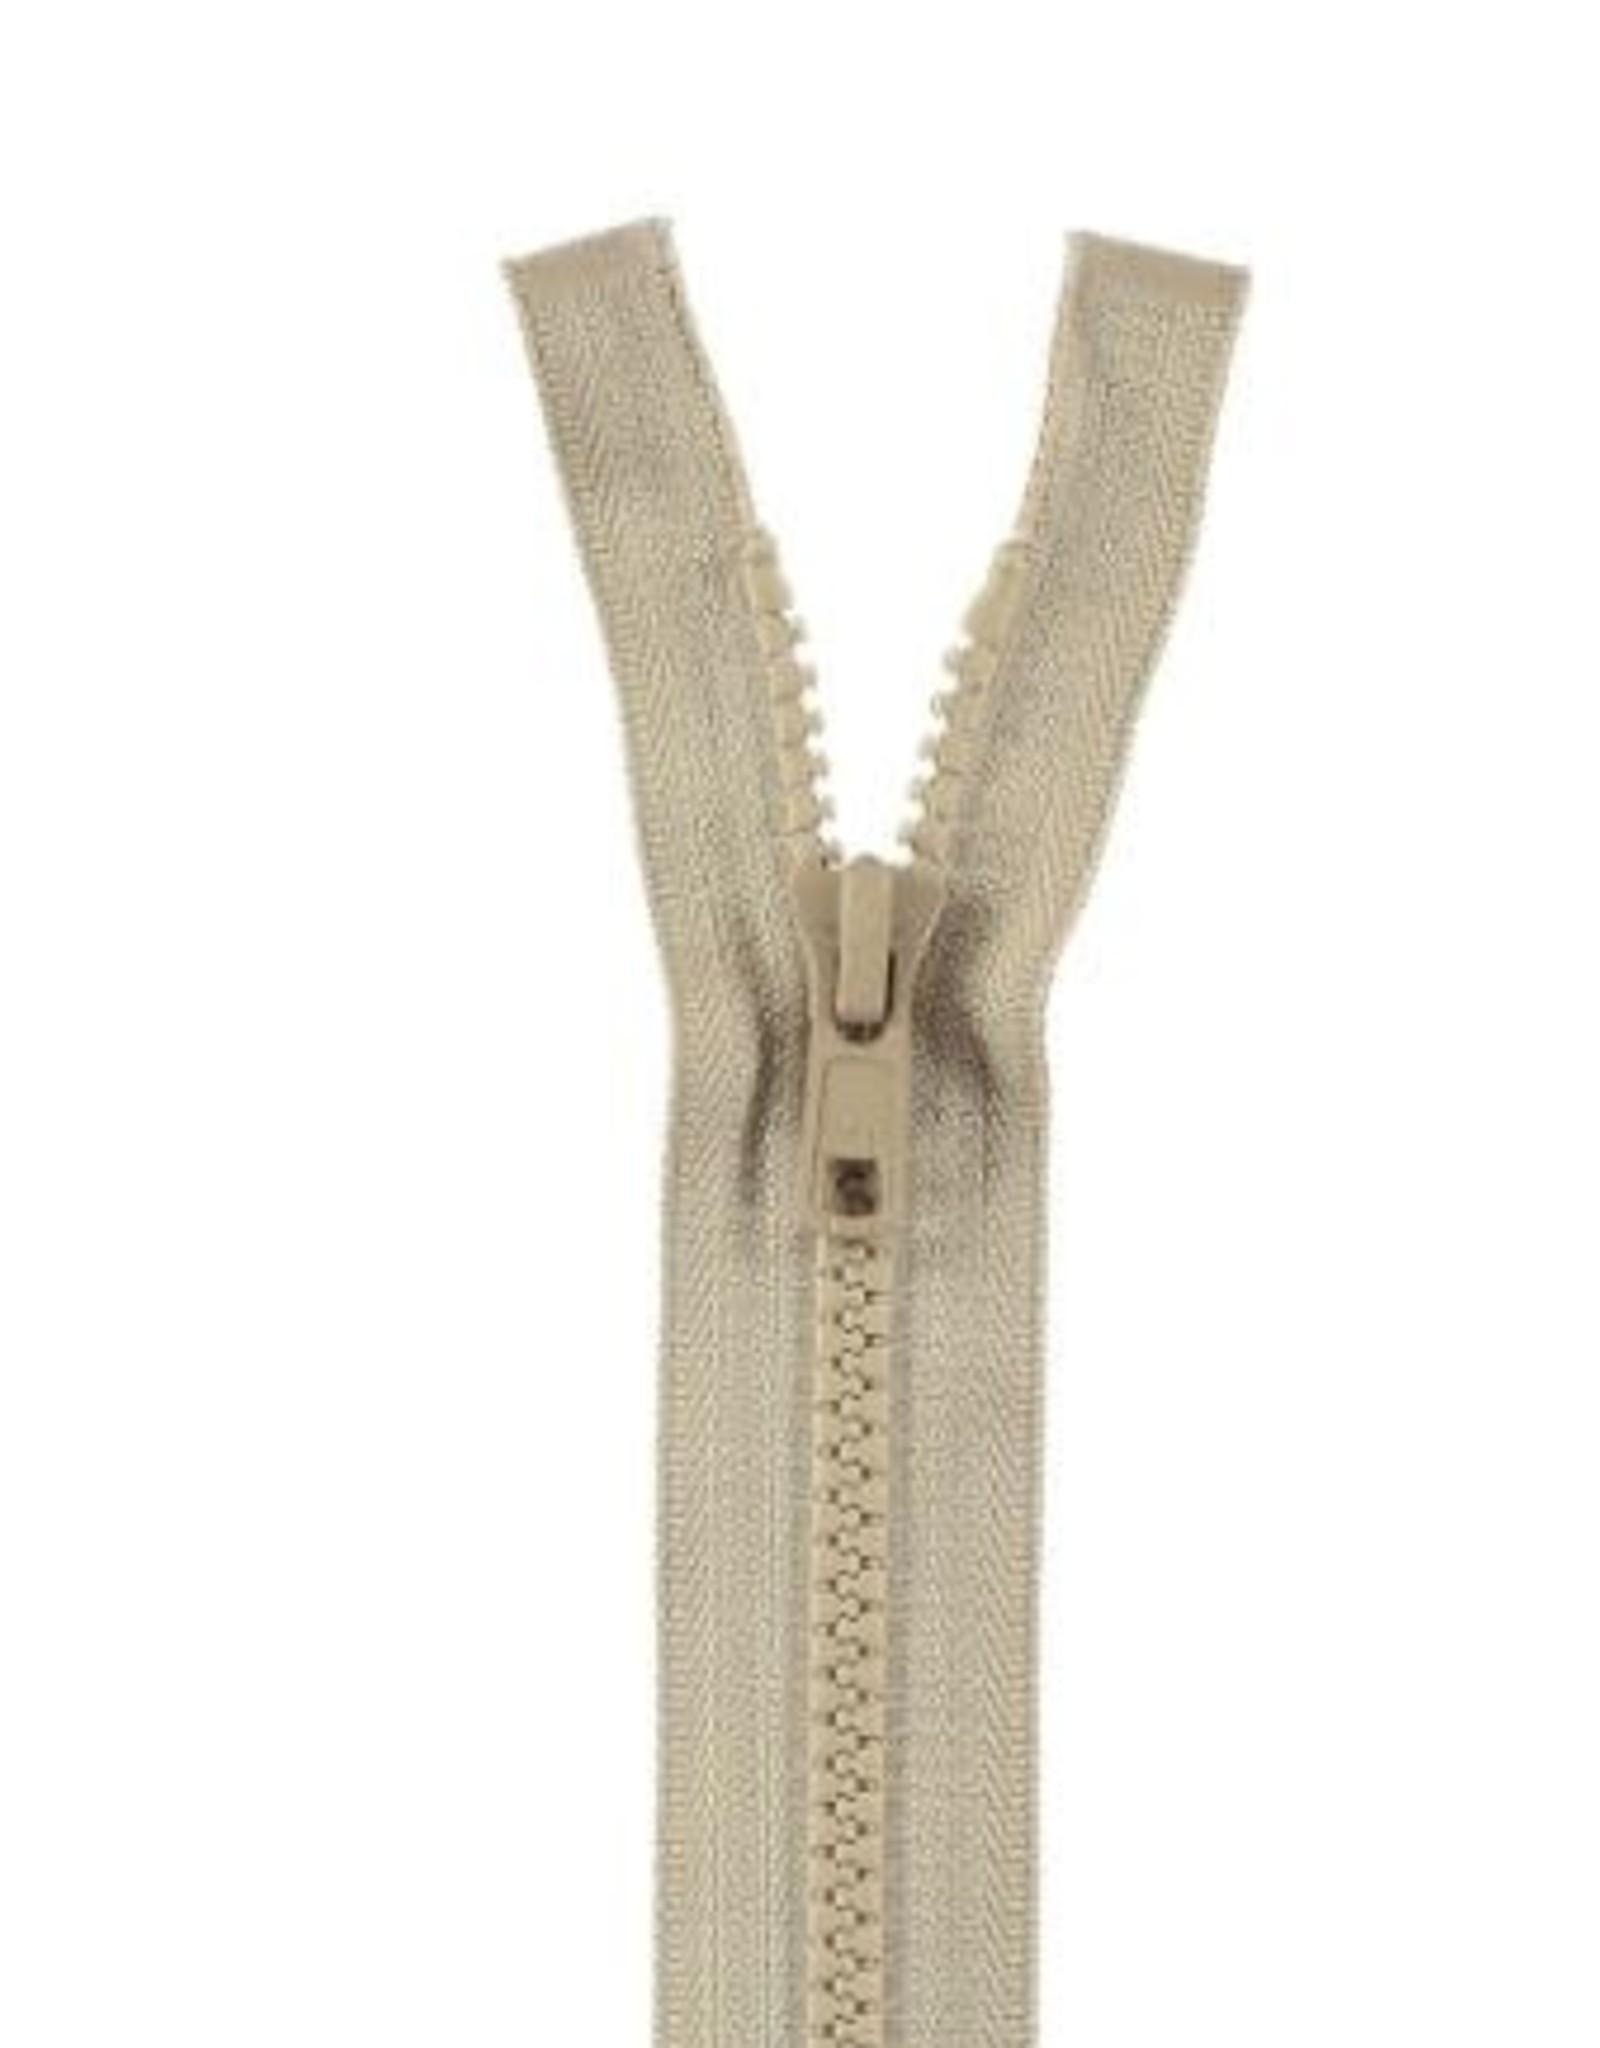 YKK BLOKRITS 5 DEELBAAR beige 573-65cm